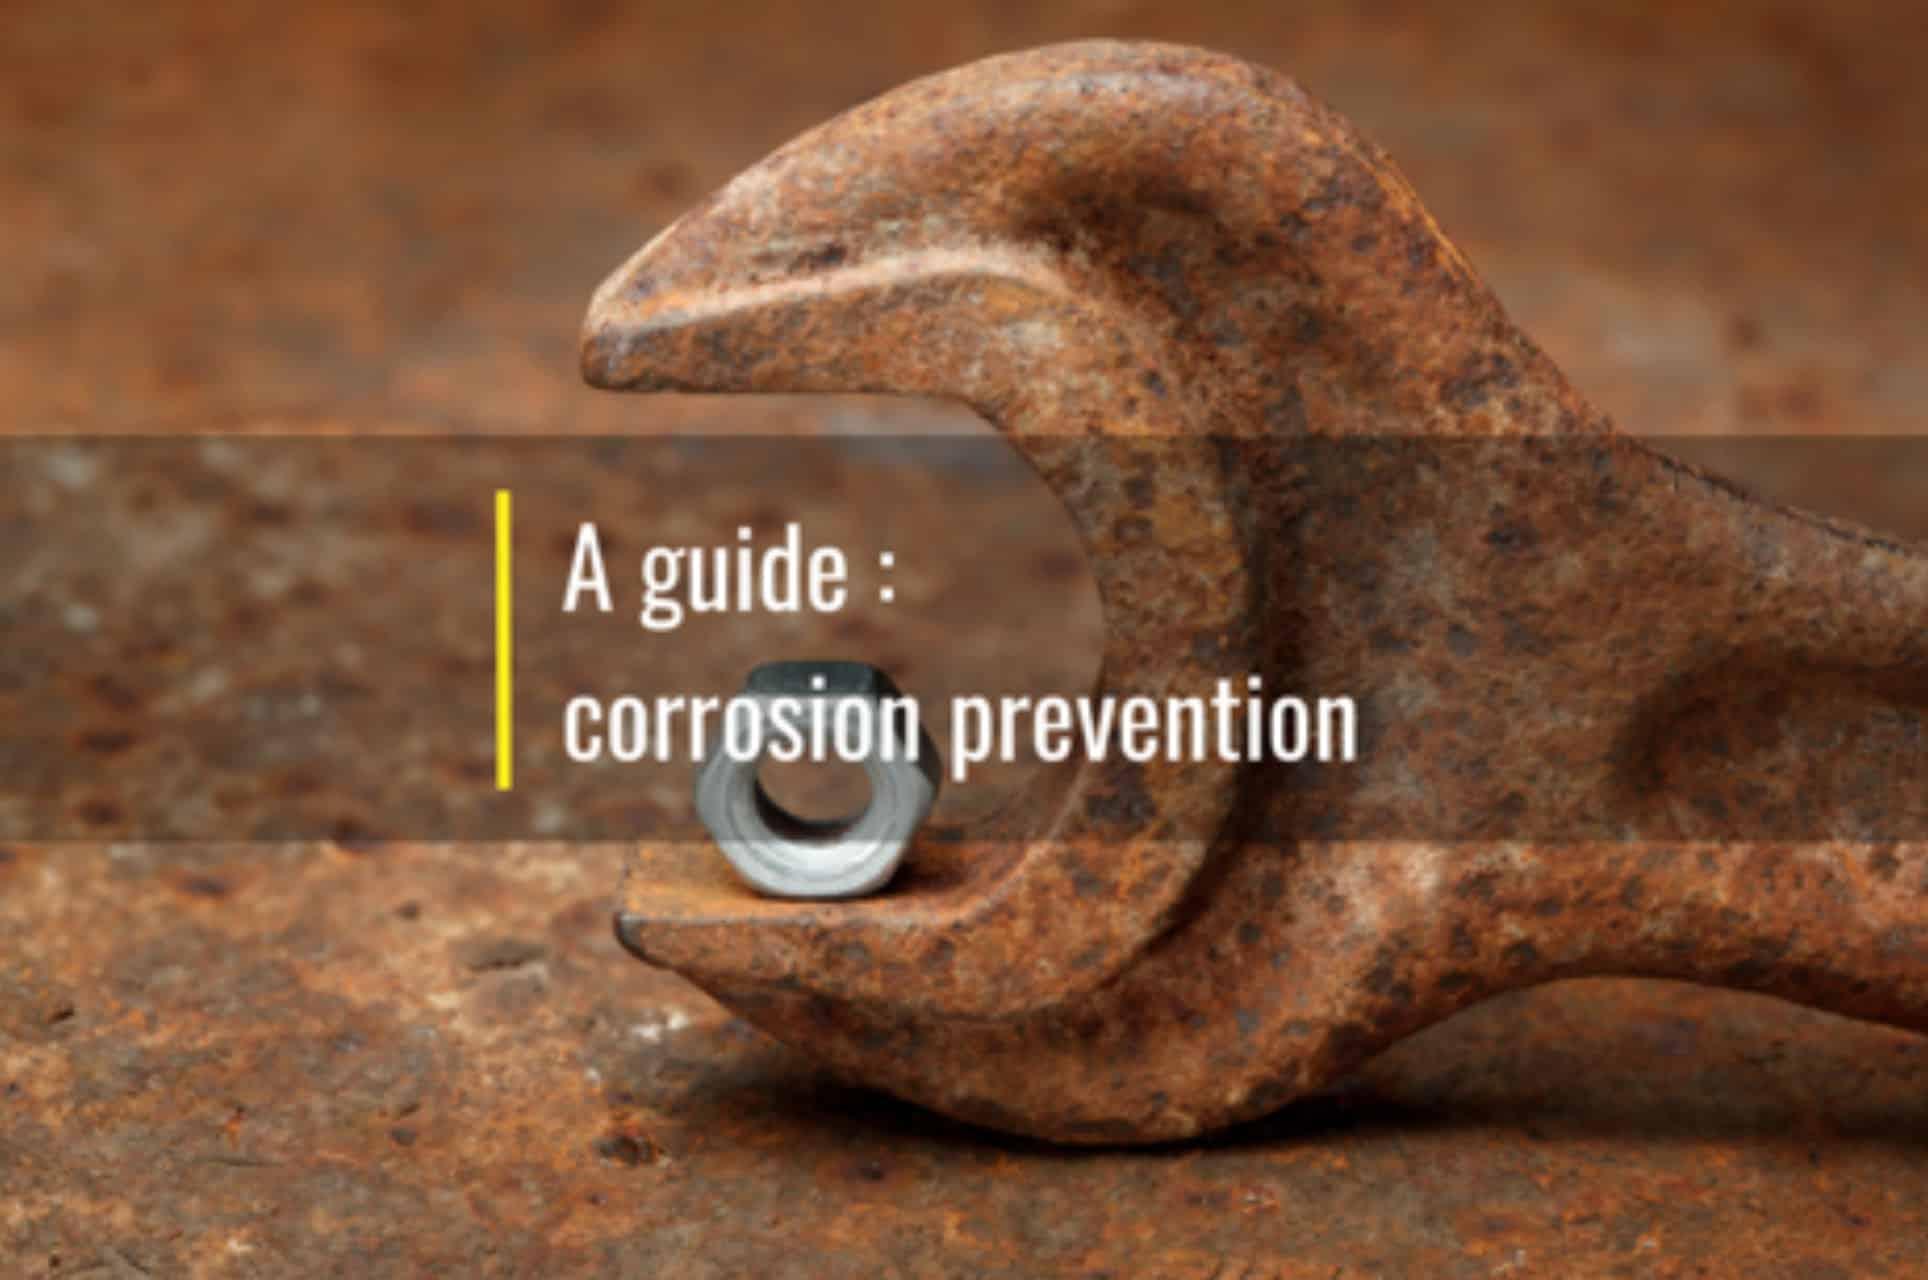 a guide to corrosion prevention